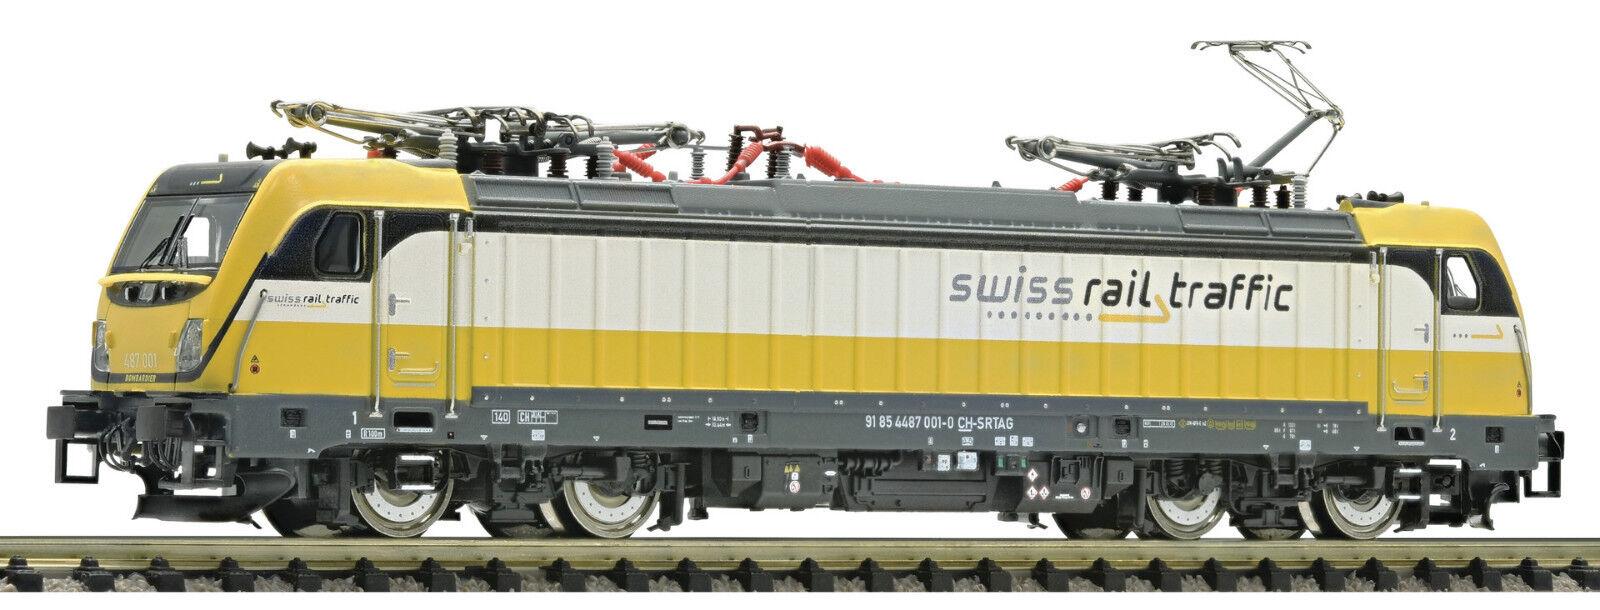 Fleischmann N 738972 E-Lok SUONO Br 487 001 Svizzero Rail Traffico SBB Ep Vi